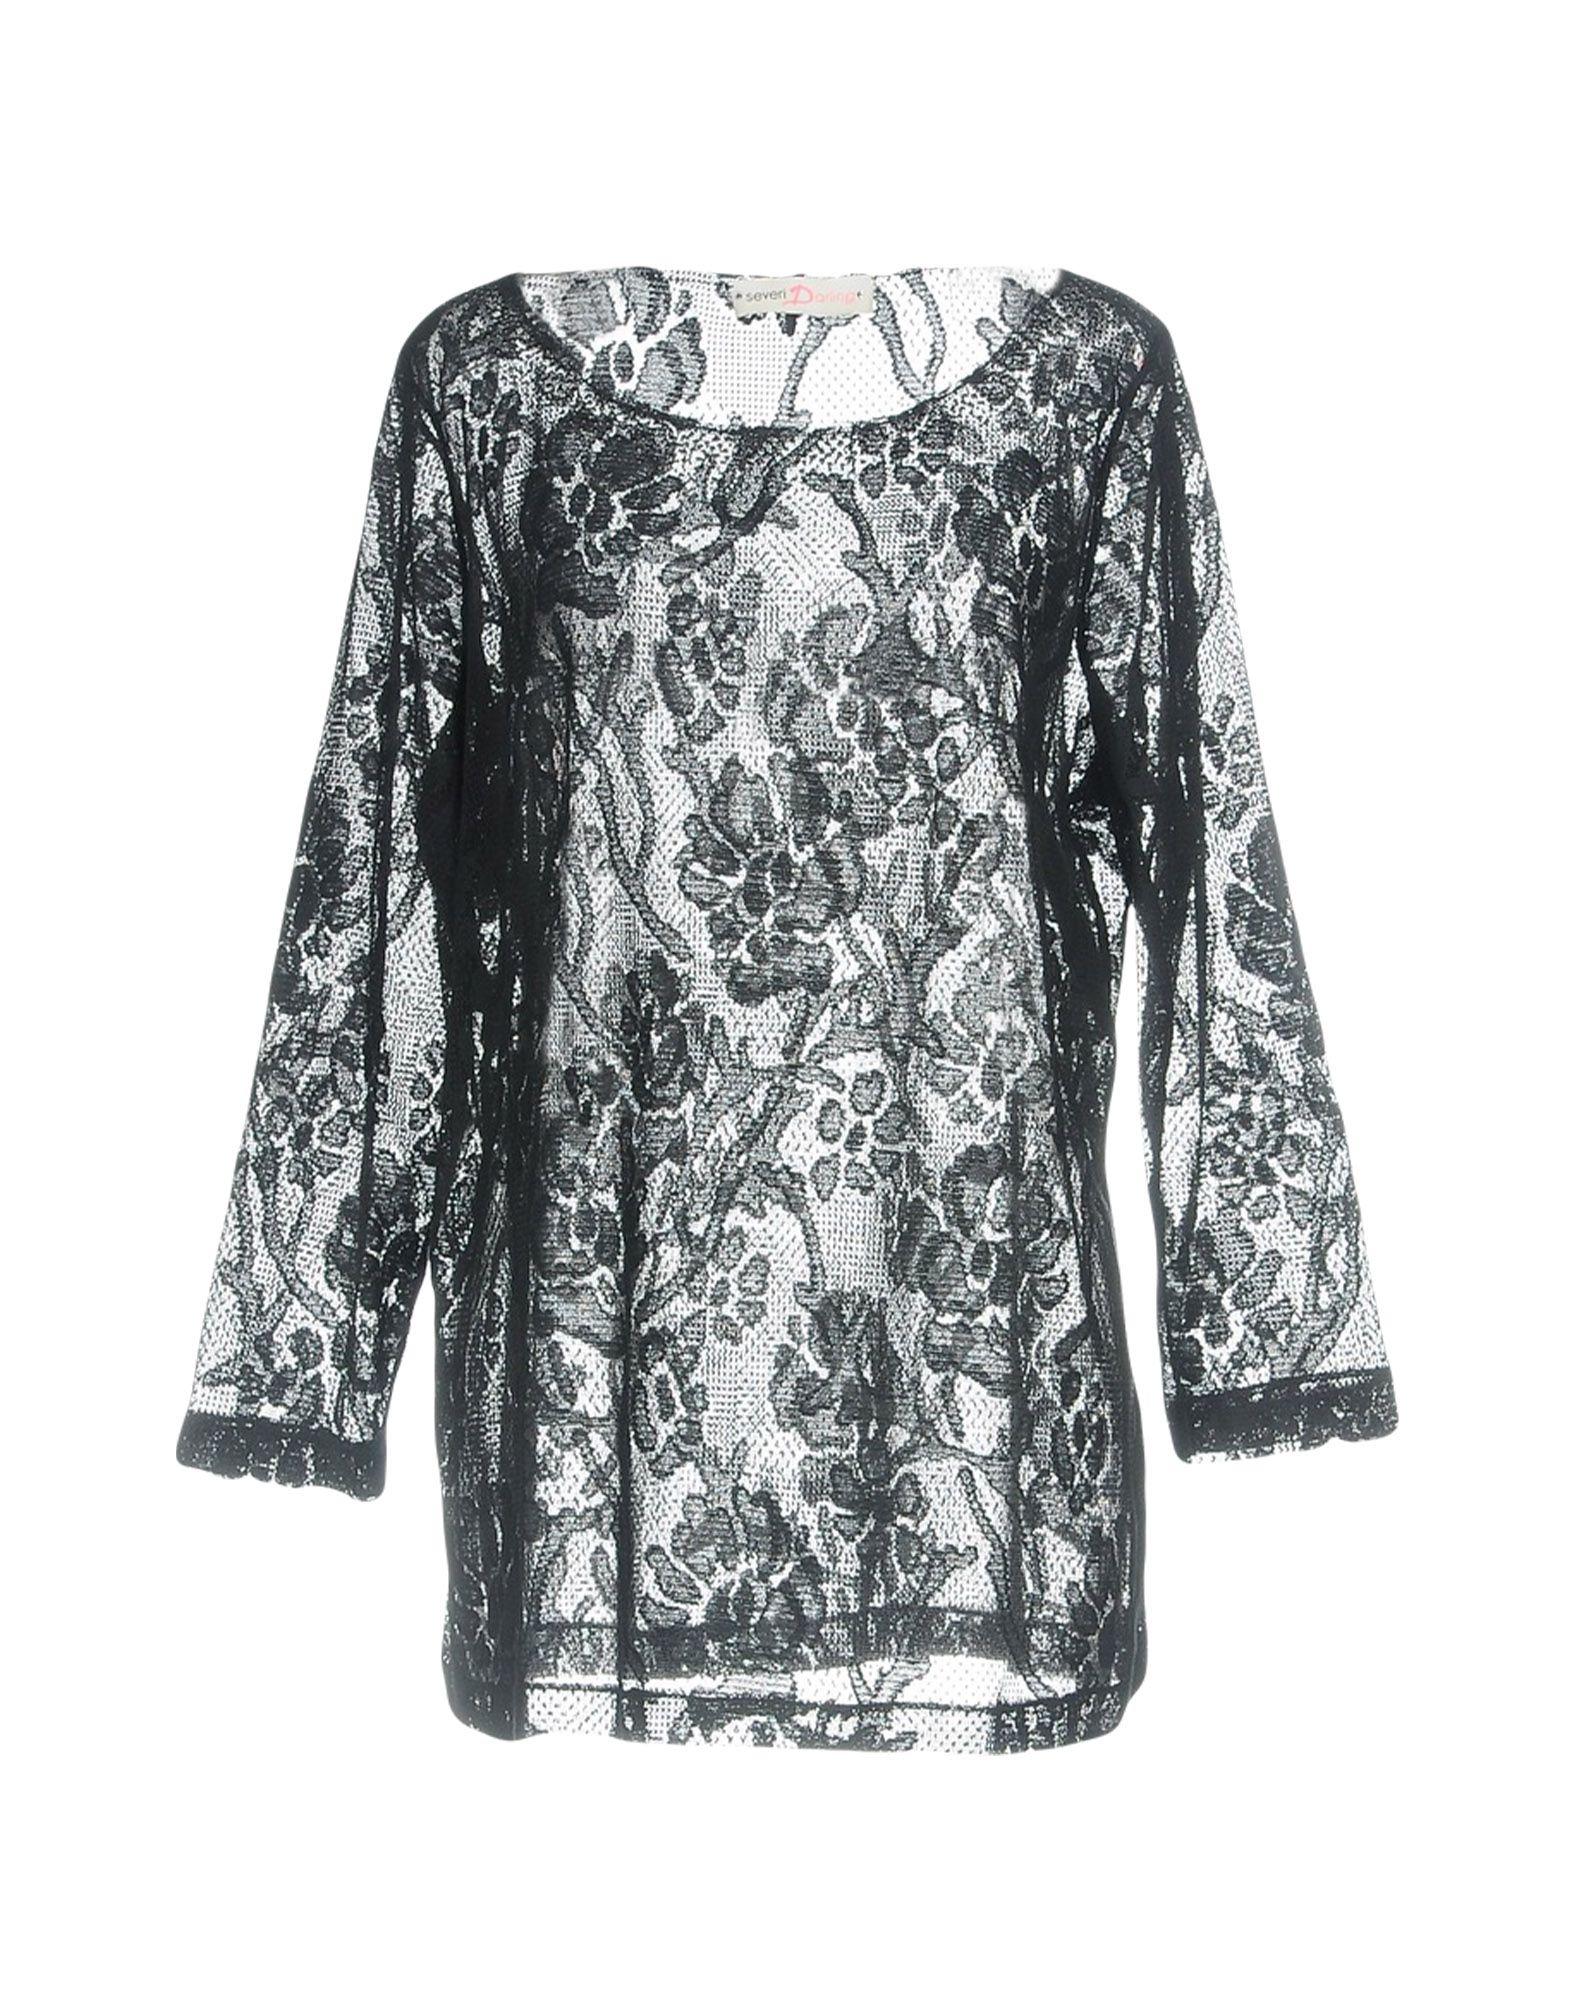 SEVERI DARLING Блузка severi darling футболка